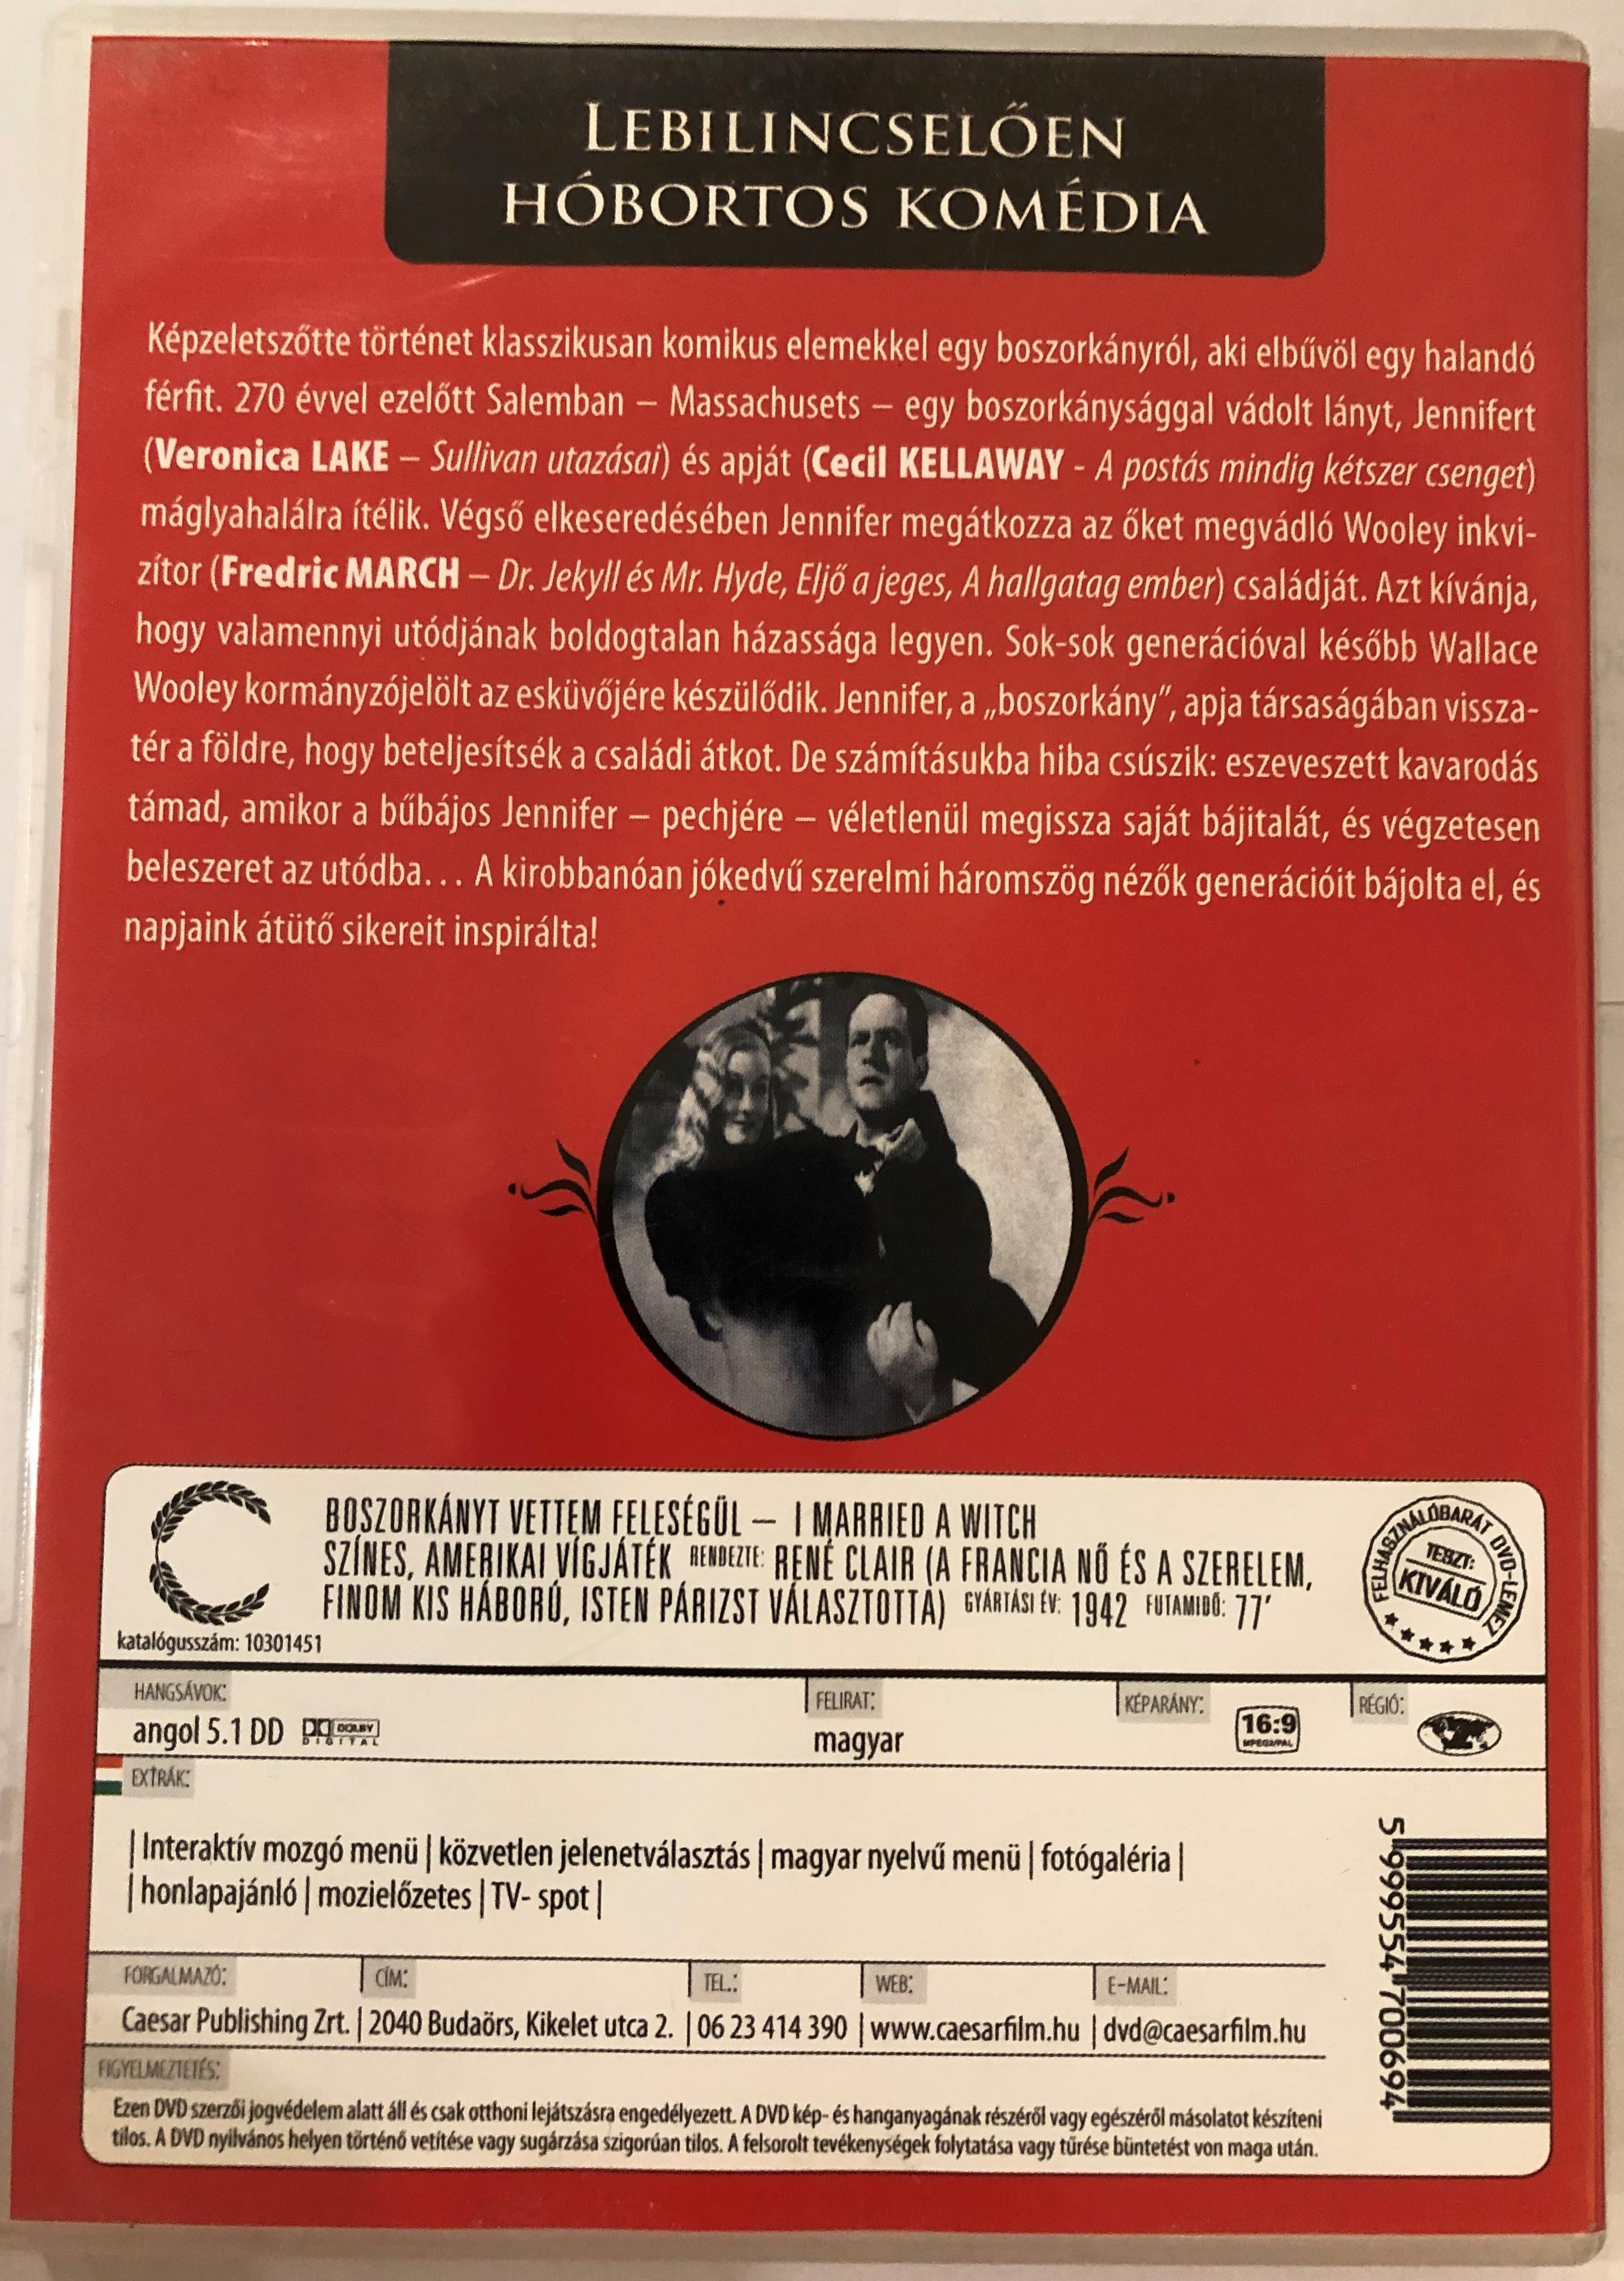 -i-married-a-witch-dvd-1942-boszork-nyt-vettem-feles-g-l-2-.jpg